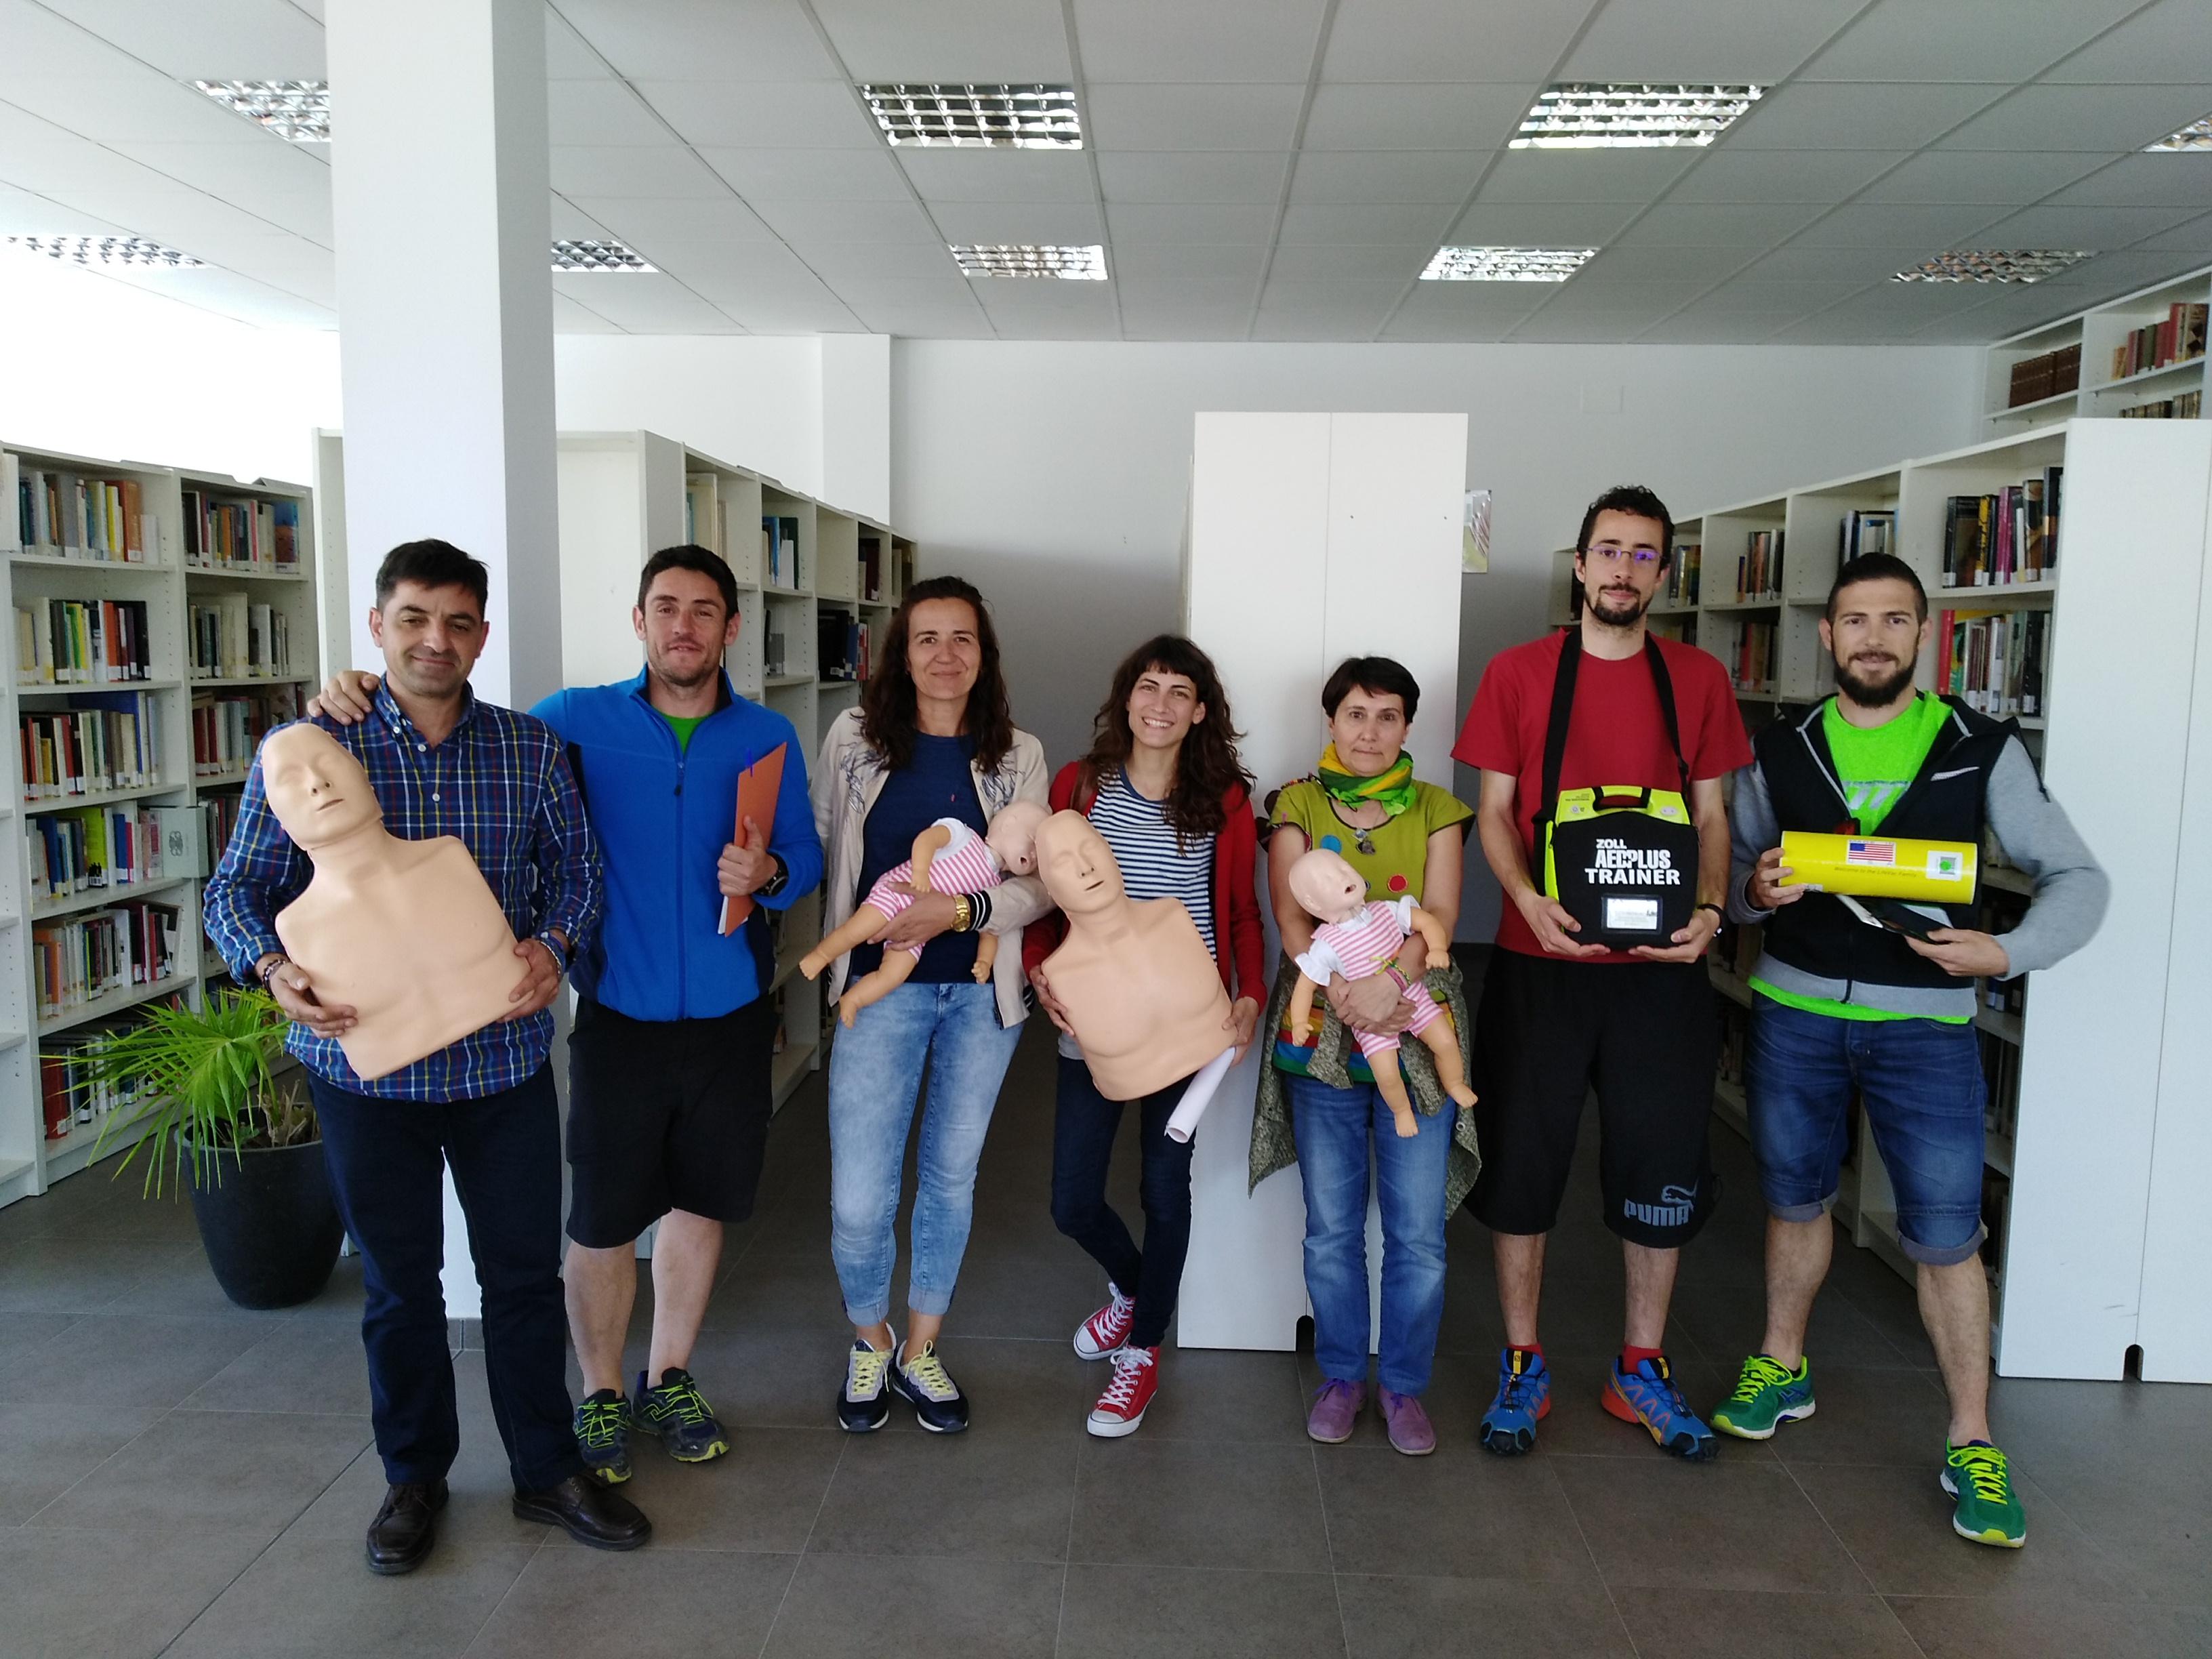 CURSO DE RECICLAJE DE DESA EN AINSA (HUESCA)